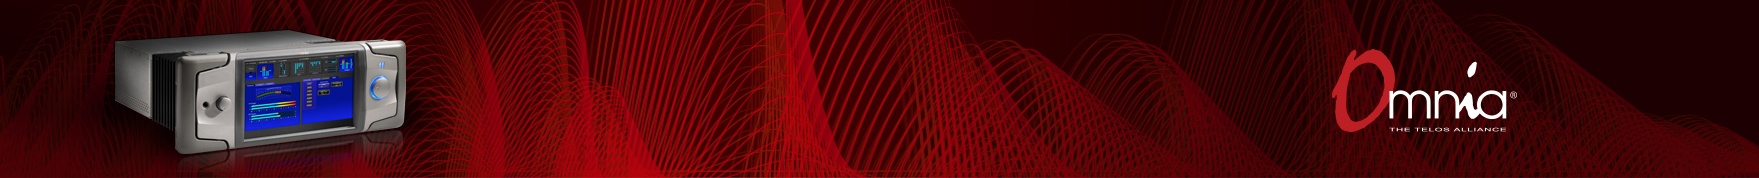 TA-Omnia11-v3.0-Header_Banner-v2-Red.jpg